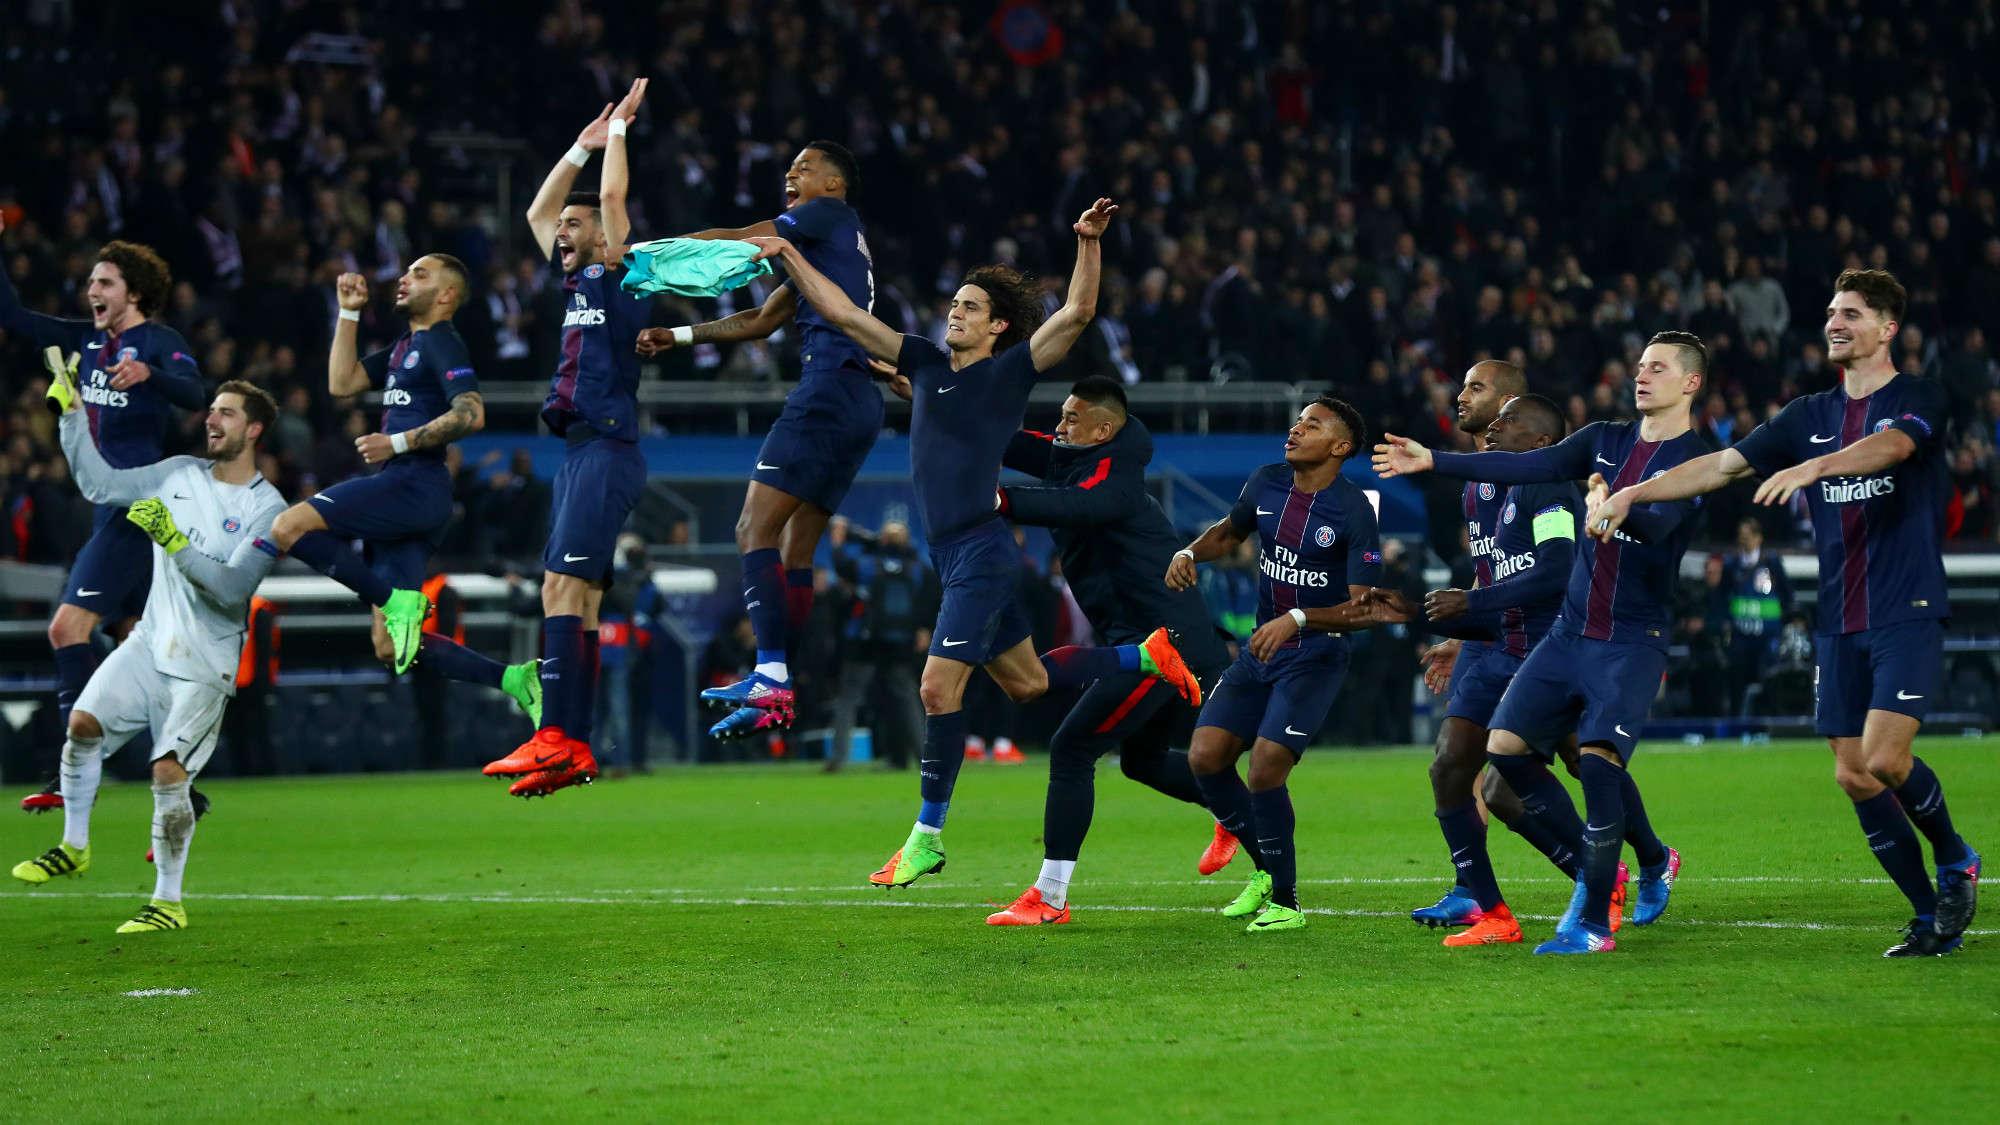 PSG vs Marseille đêm nay 23/10/2017 giải vô địch Ligue 1